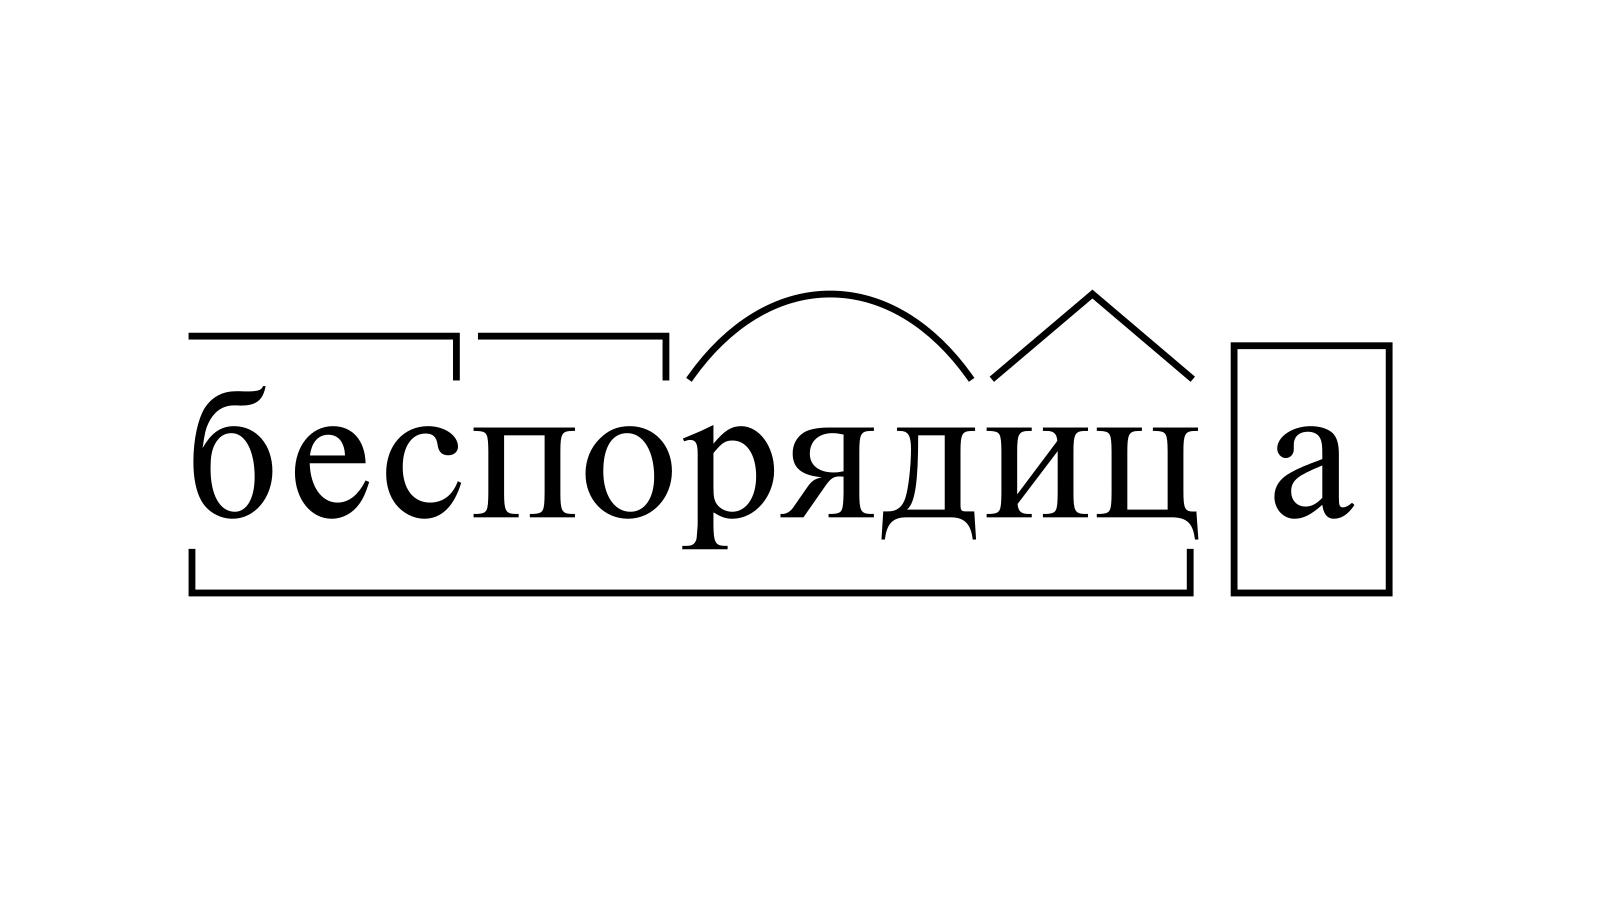 Разбор слова «беспорядица» по составу